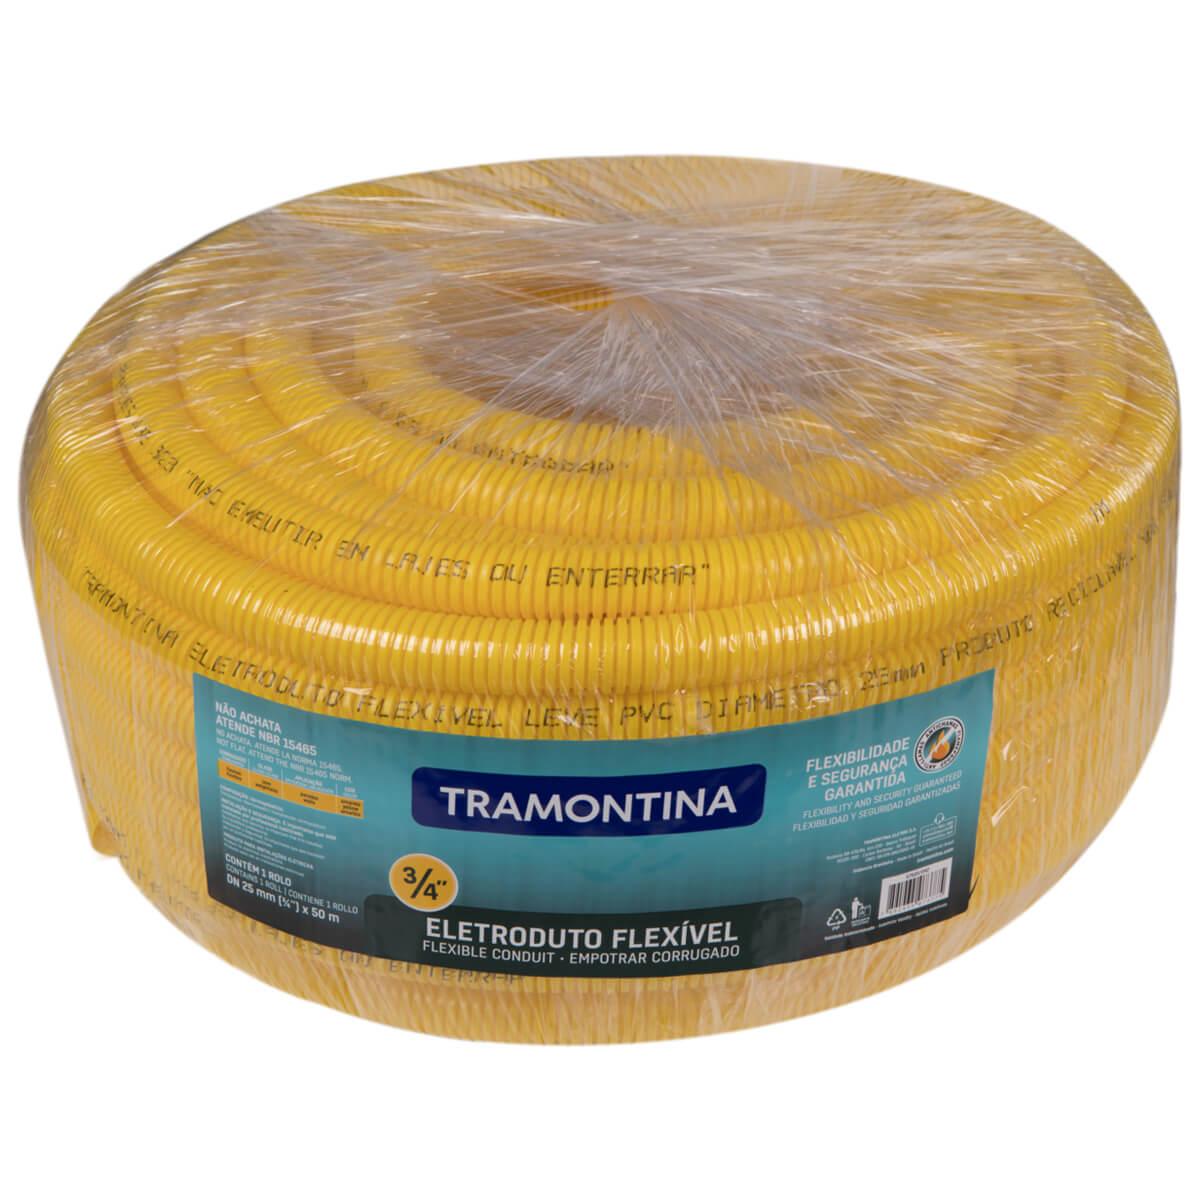 "Eletroduto Corrugado 3/4"" 50 Metros Amarelo - Tramontina"